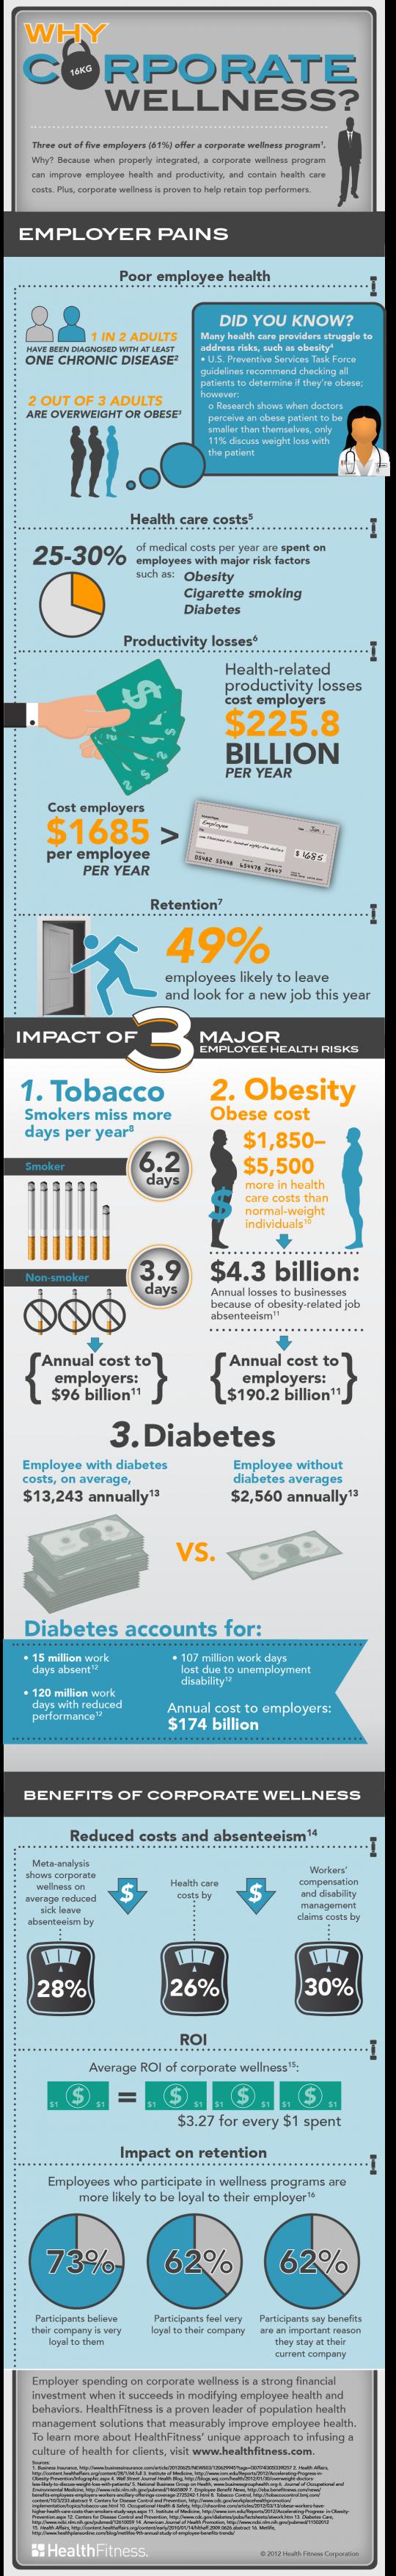 Why Corporate Wellness